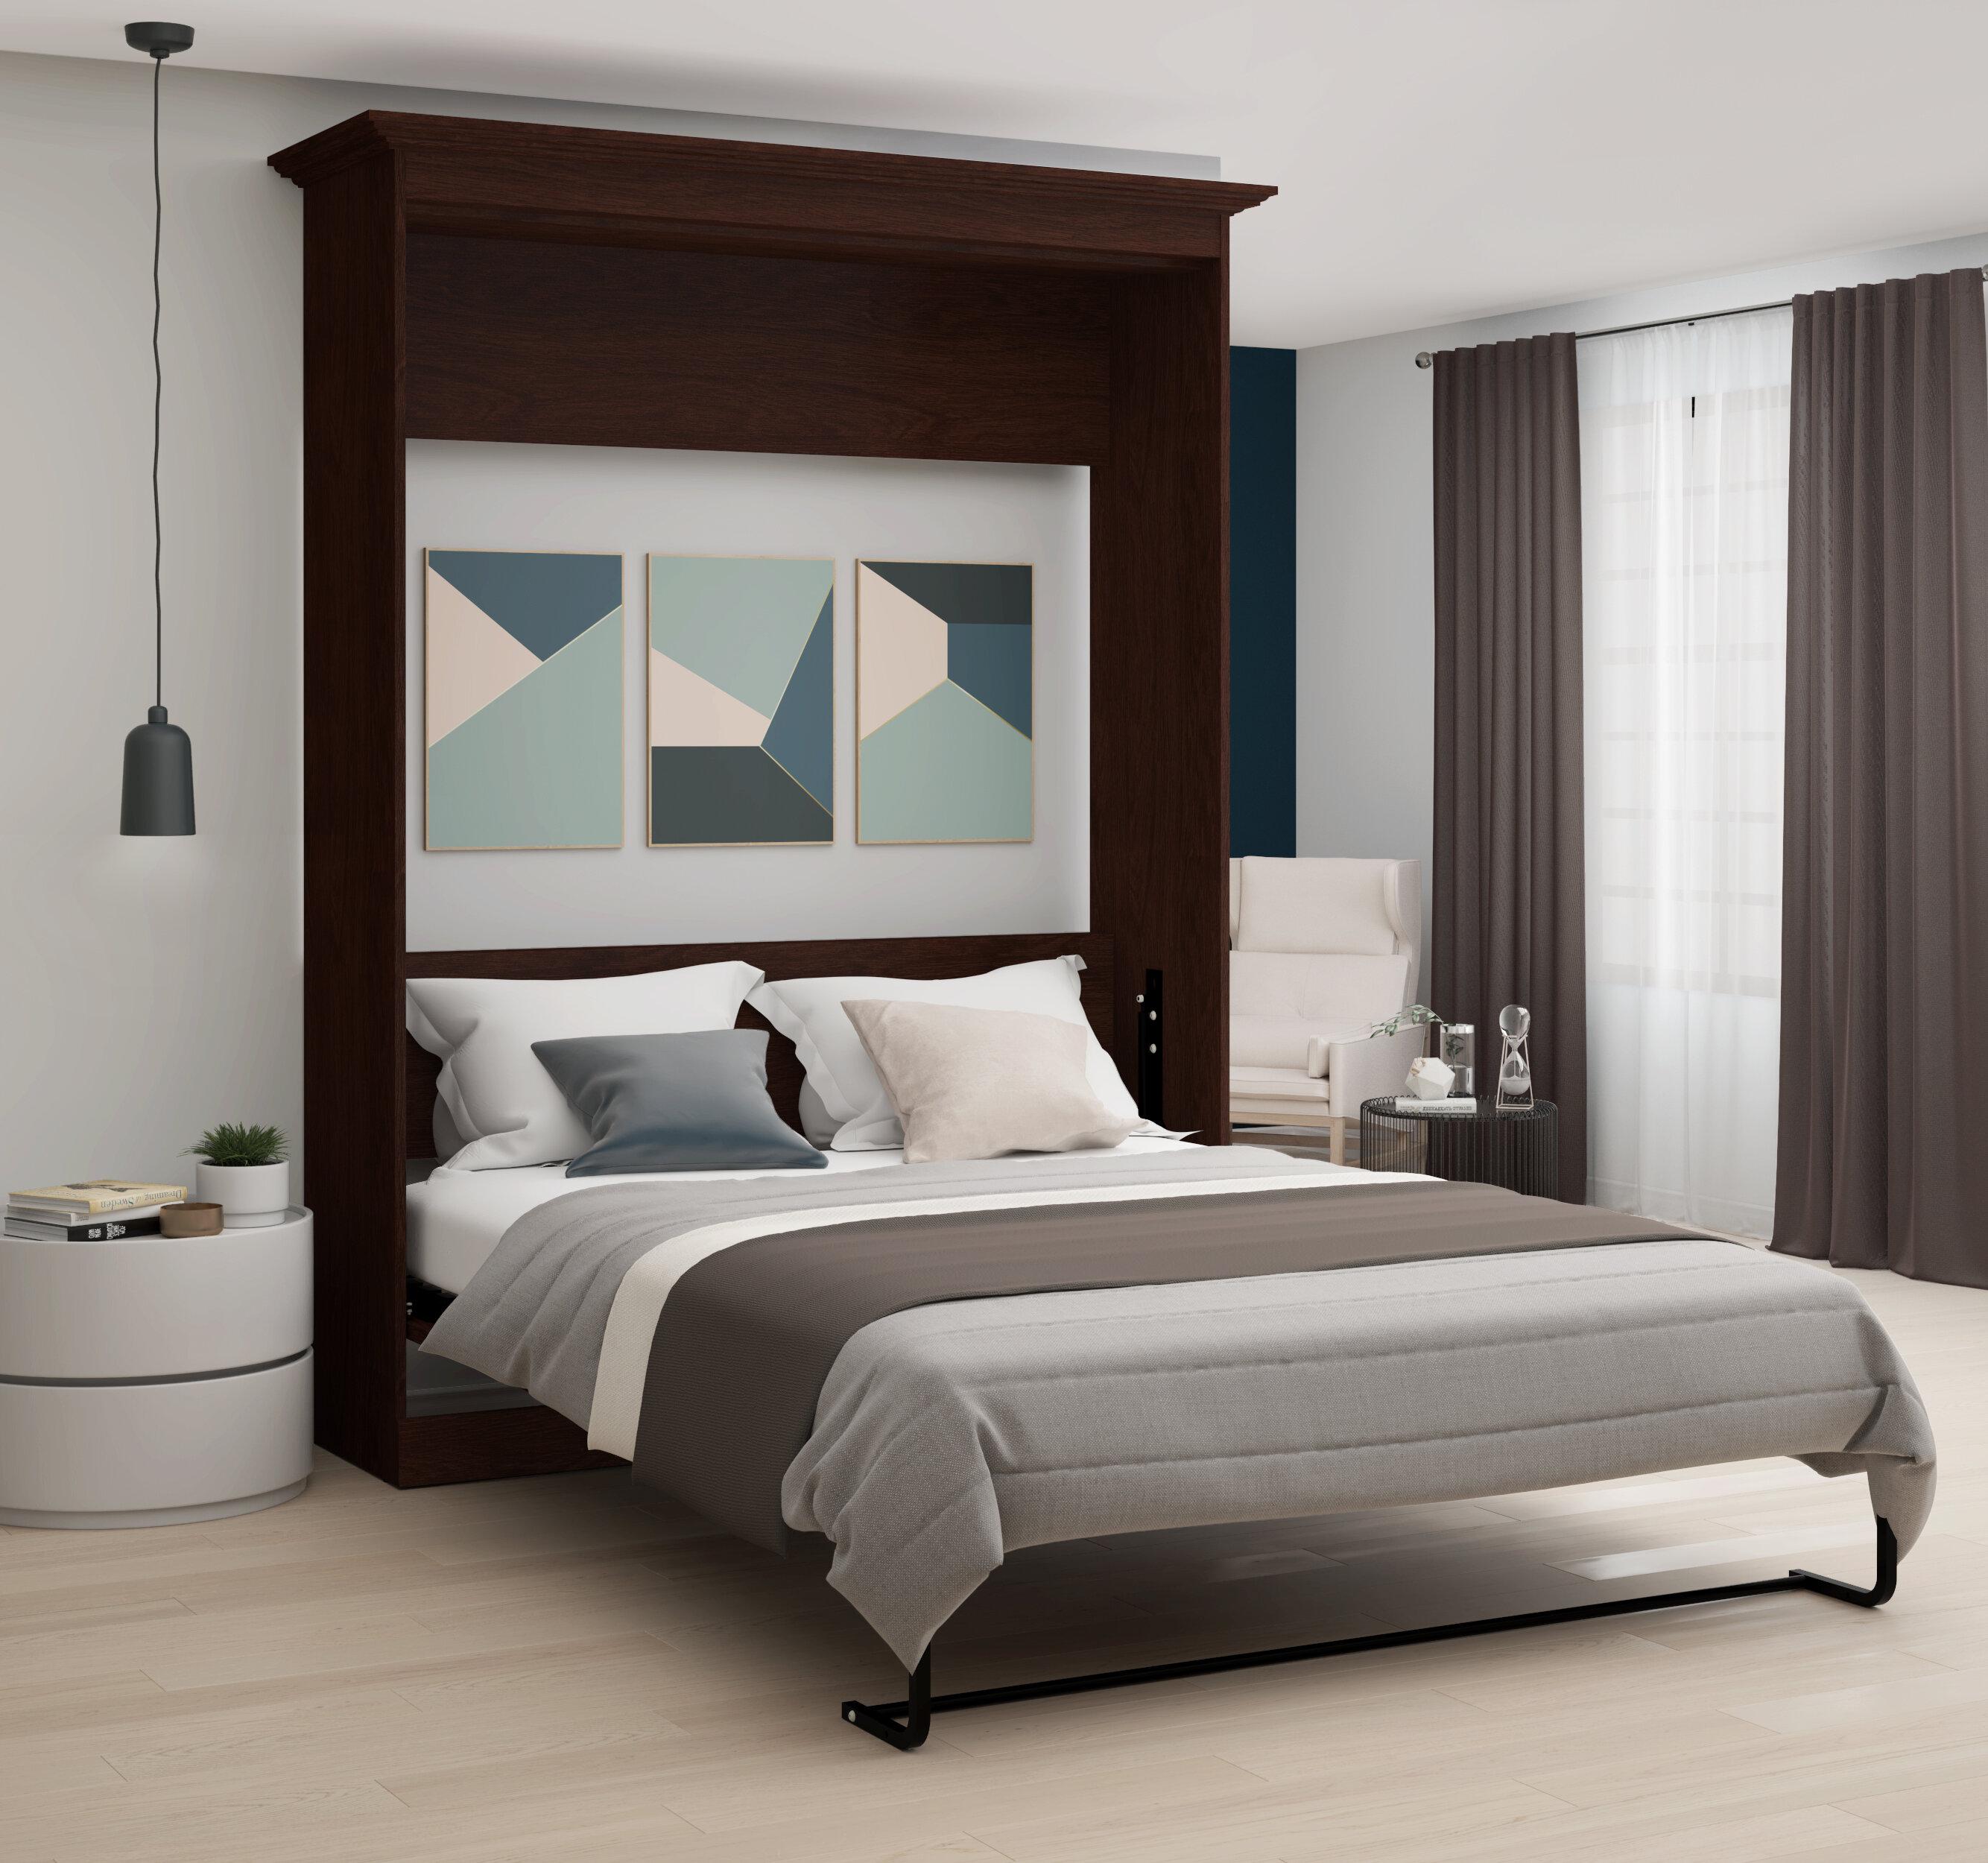 Murphy Bed.Burris Wall Murphy Bed